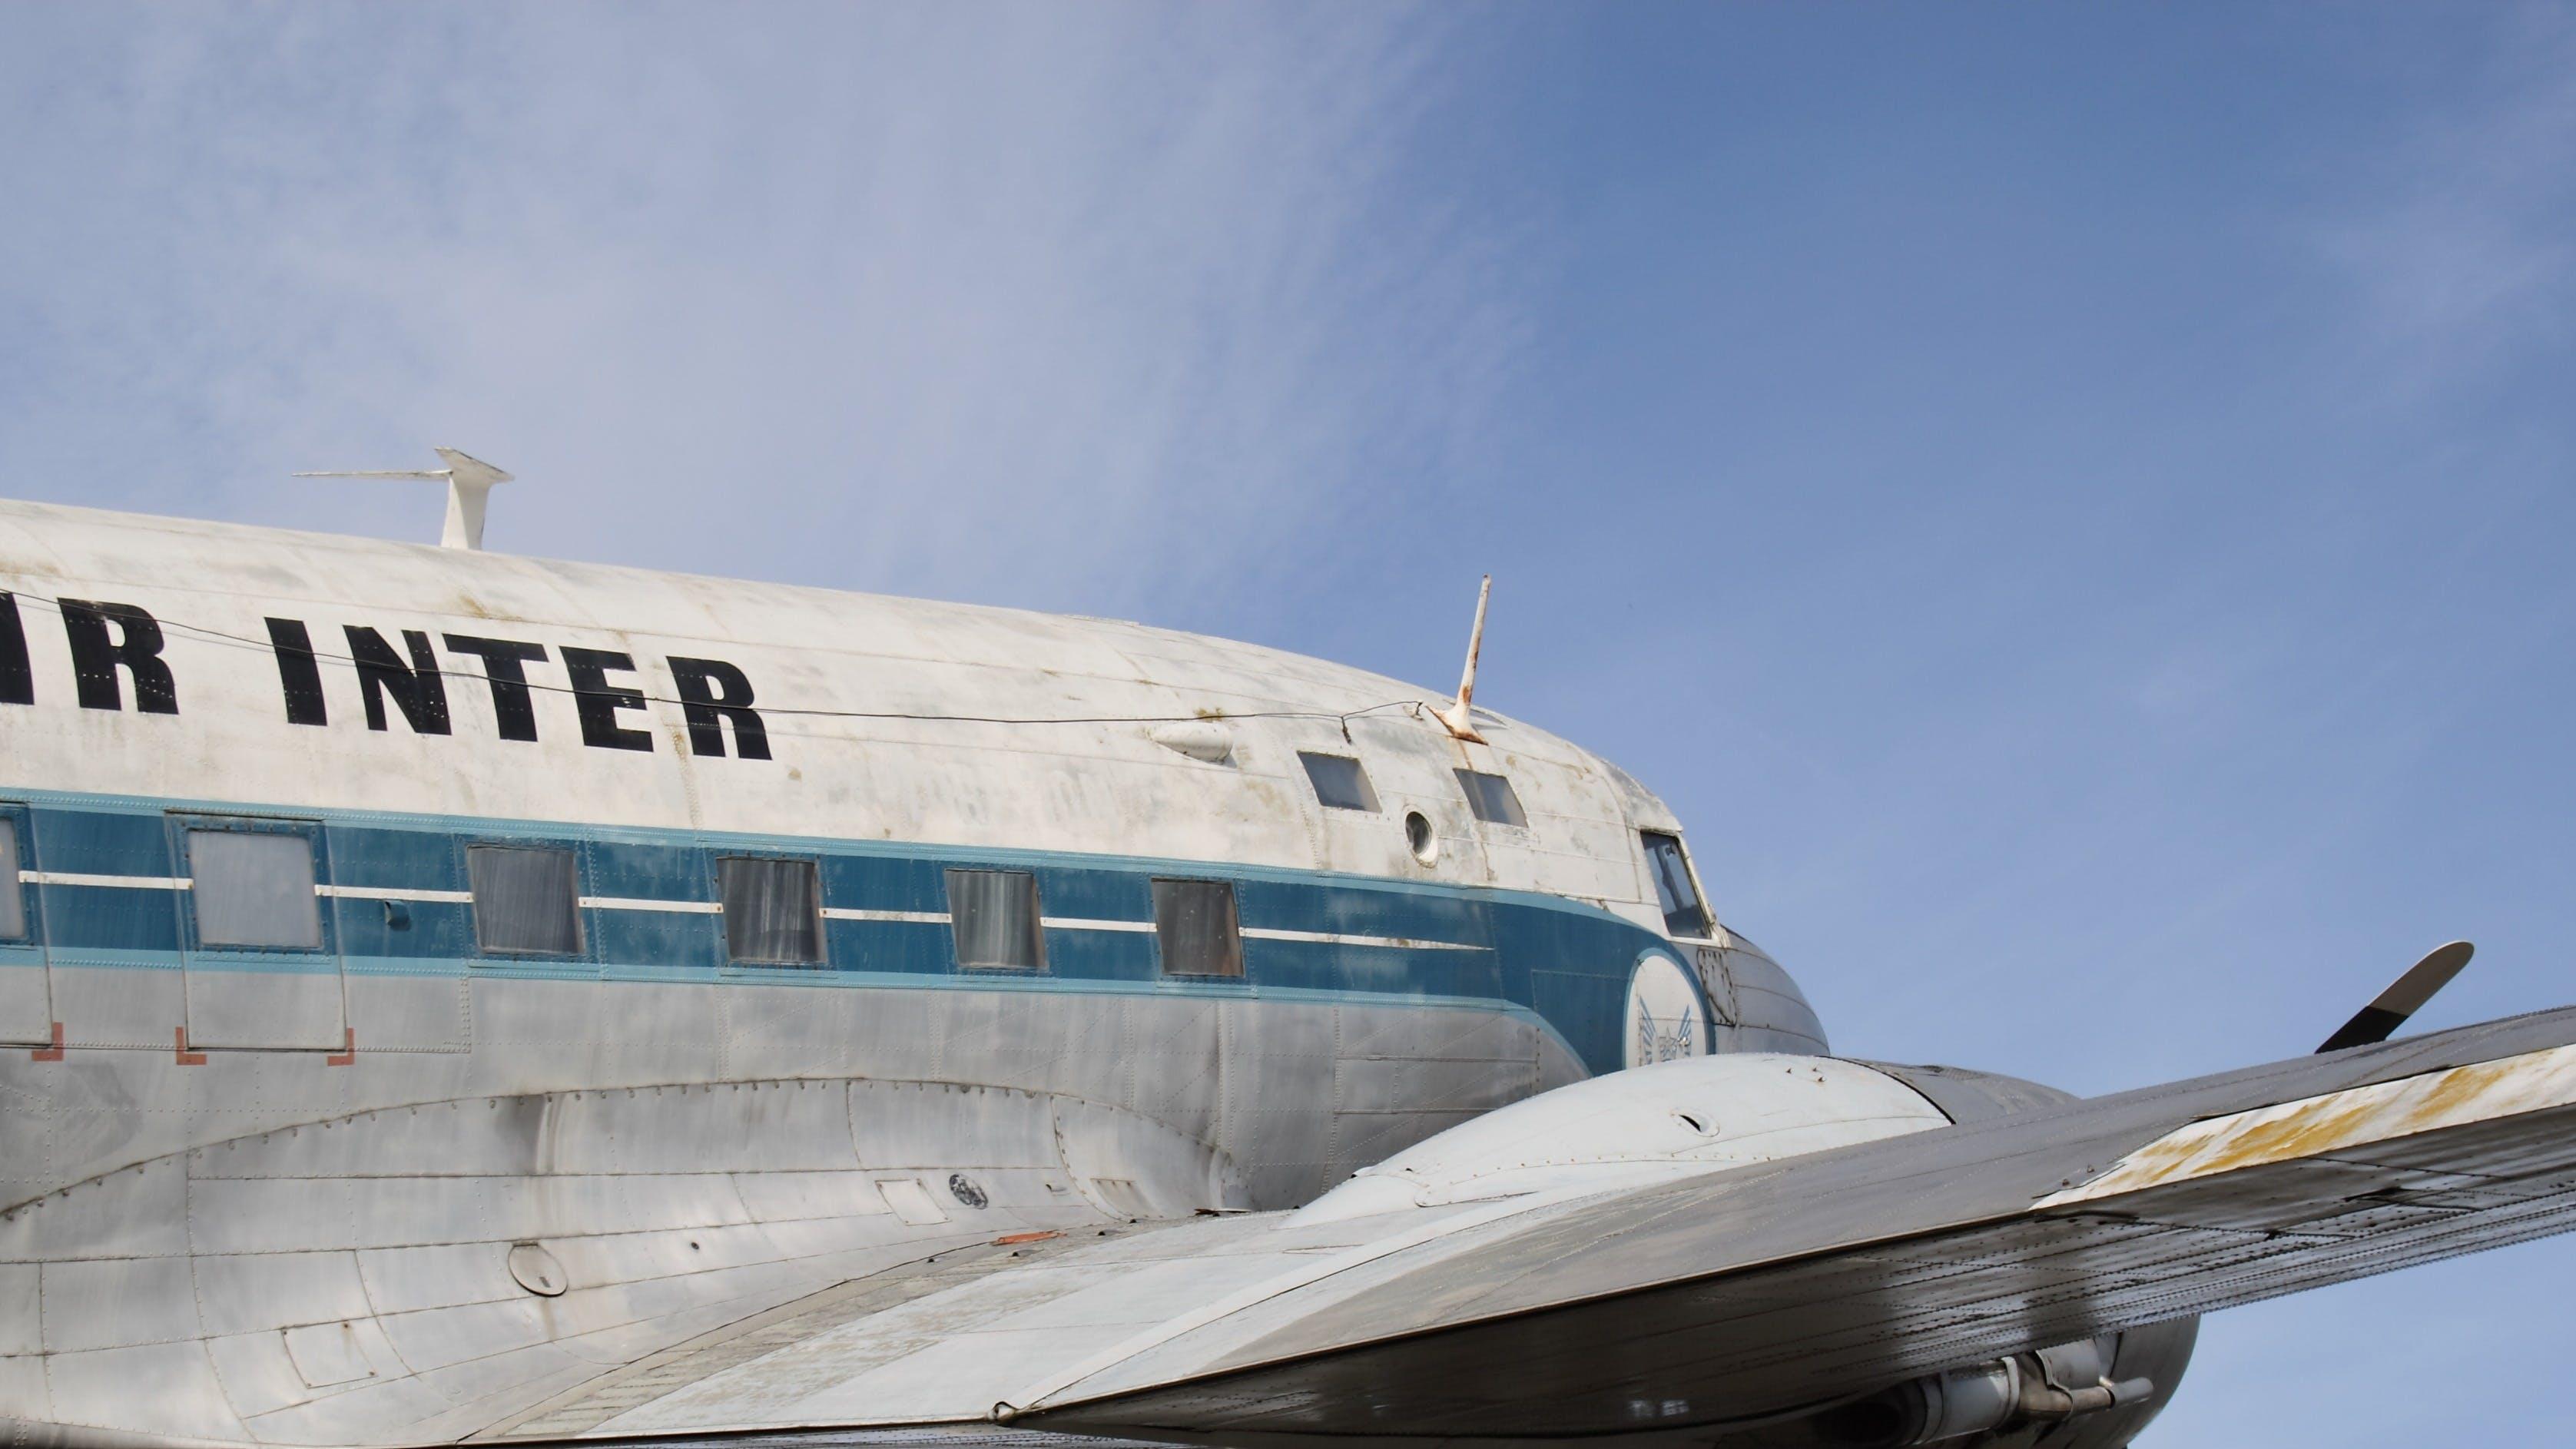 White Gray Teal Air Bus Under Blue Sky